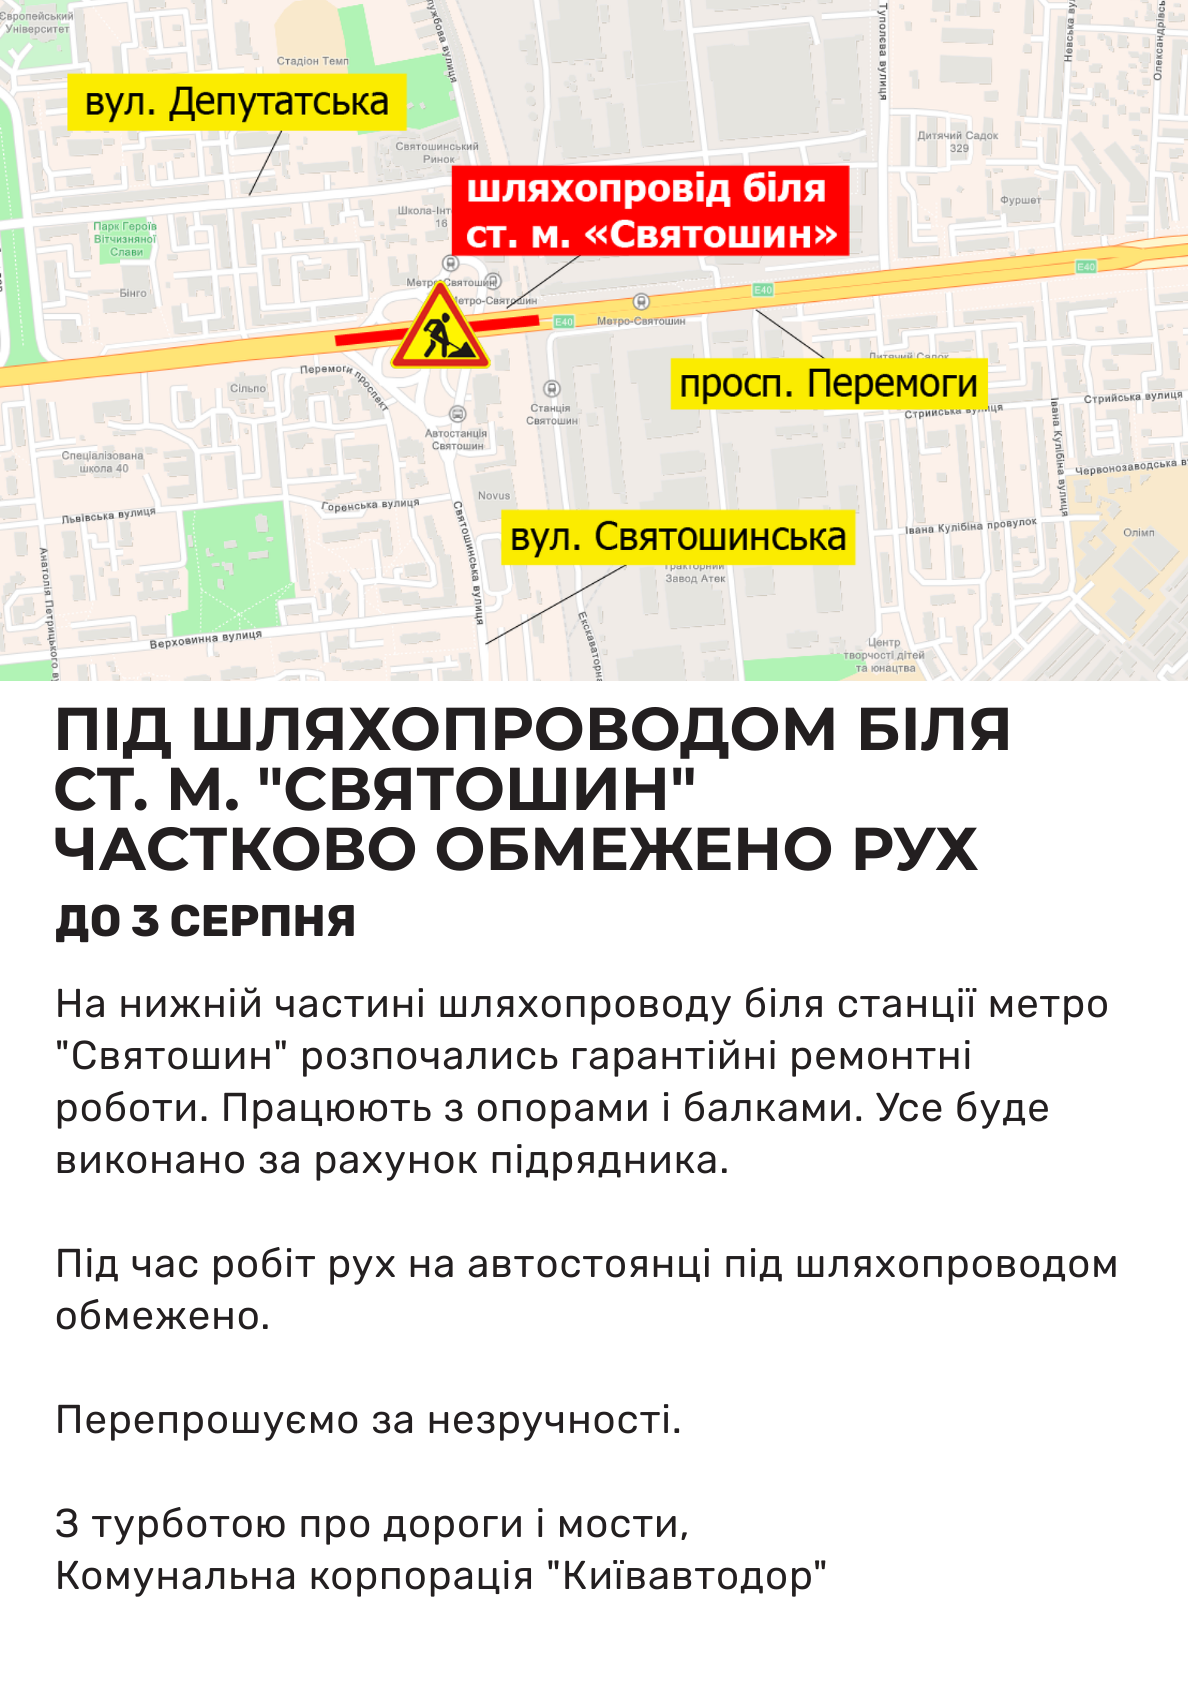 Фото: пресс-служба Киевавтодора